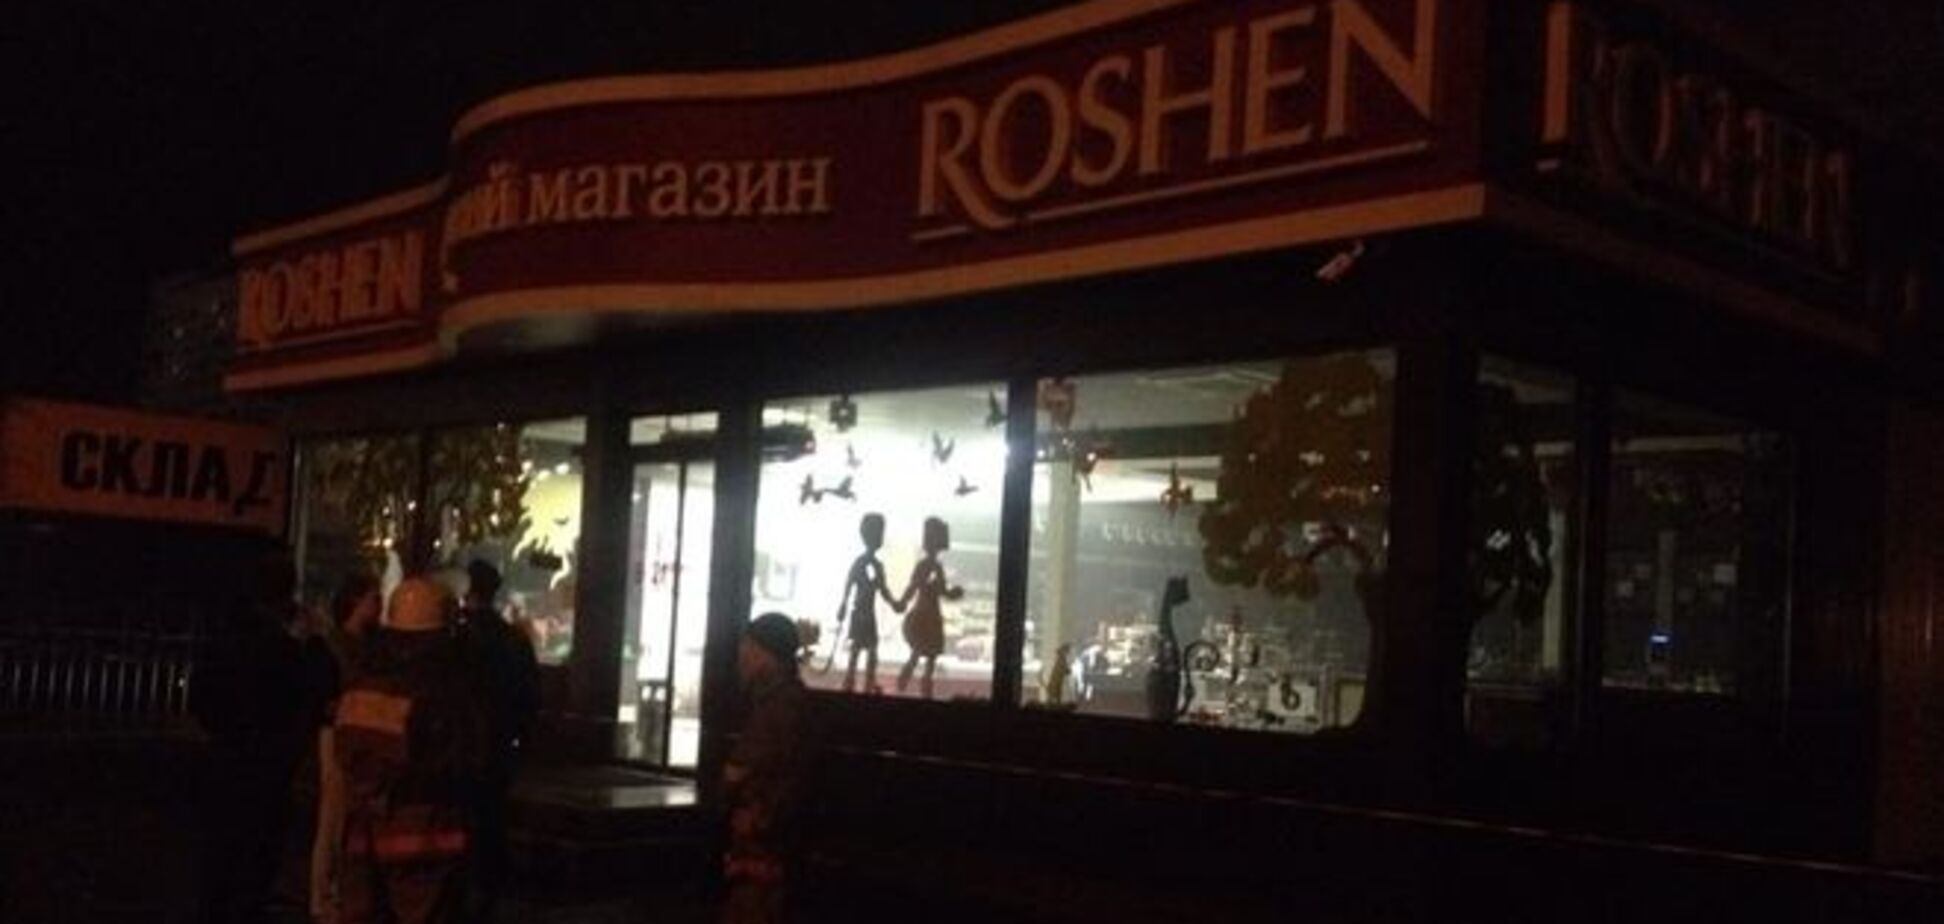 В Киеве на Оболони взорвали магазин ROSHEN. Фото и видео с места события